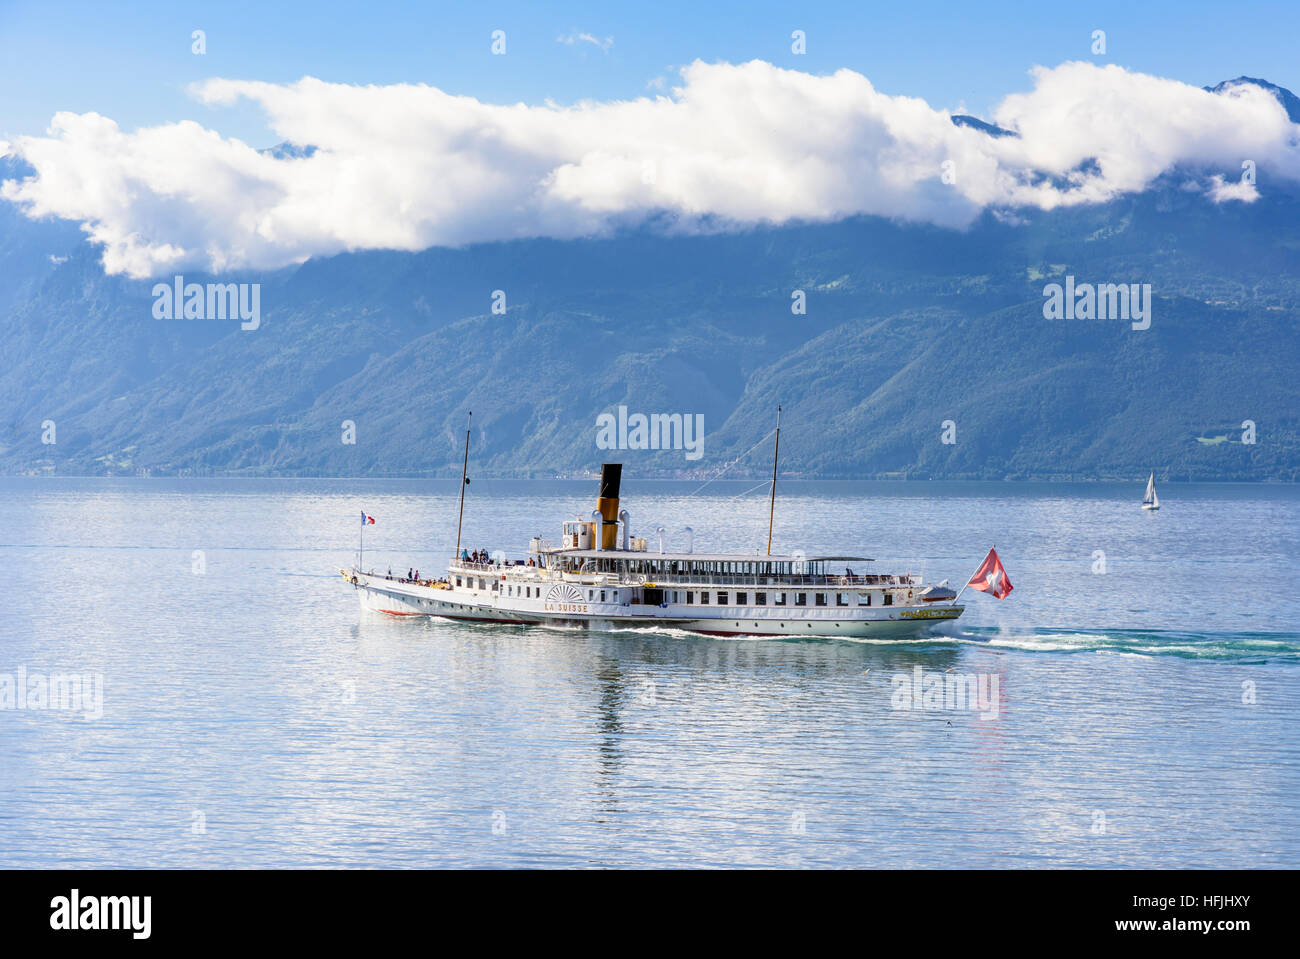 The Belle Epoque paddle steamer La Suisse leaves, Lausanne on Lac Leman, Switzerland - Stock Image